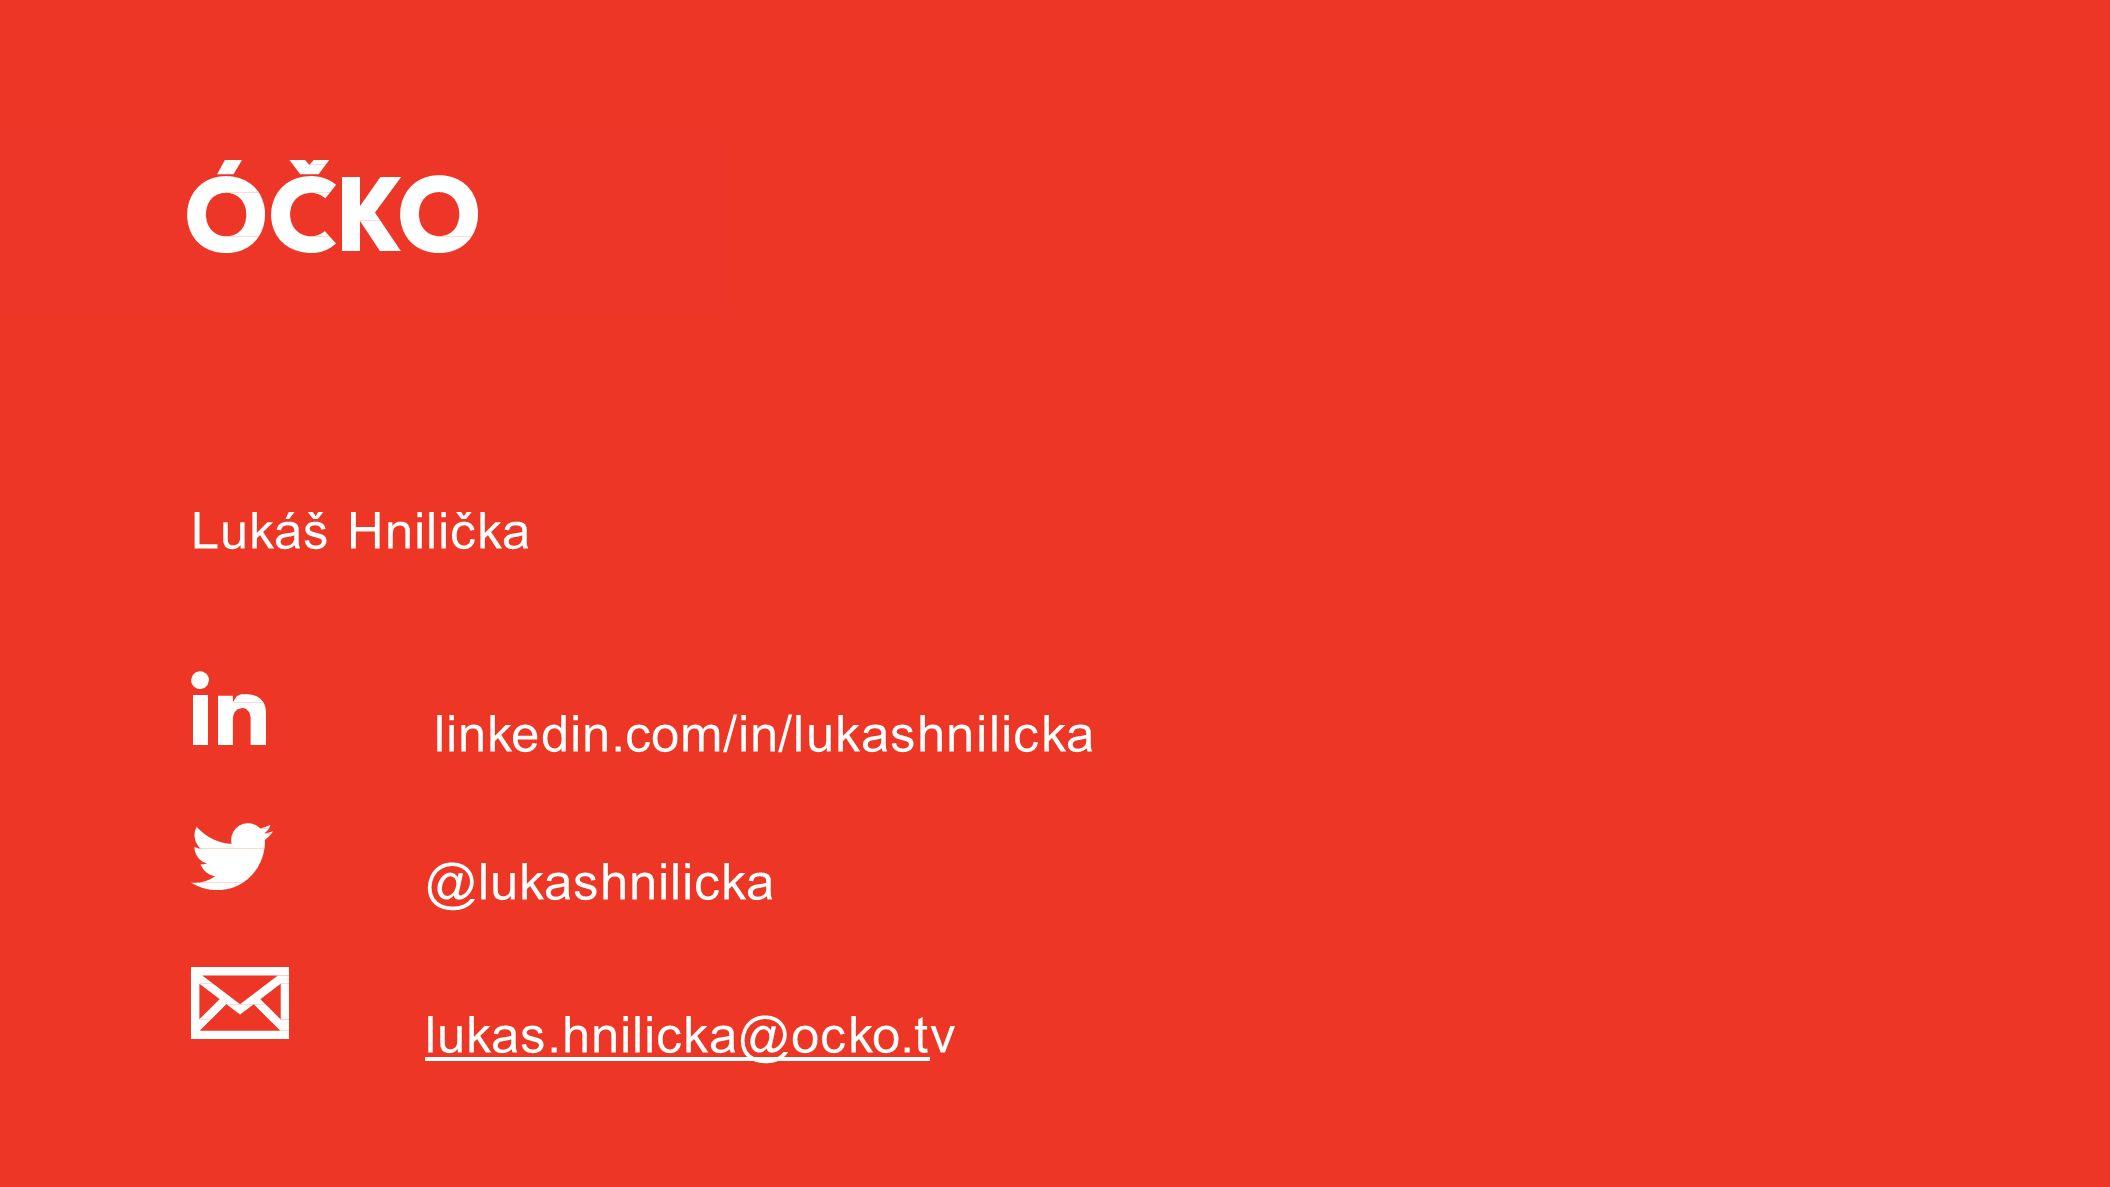 Lukáš Hnilička linkedin.com/in/lukashnilicka @lukashnilicka lukas.hnilicka@ocko.tlukas.hnilicka@ocko.tv